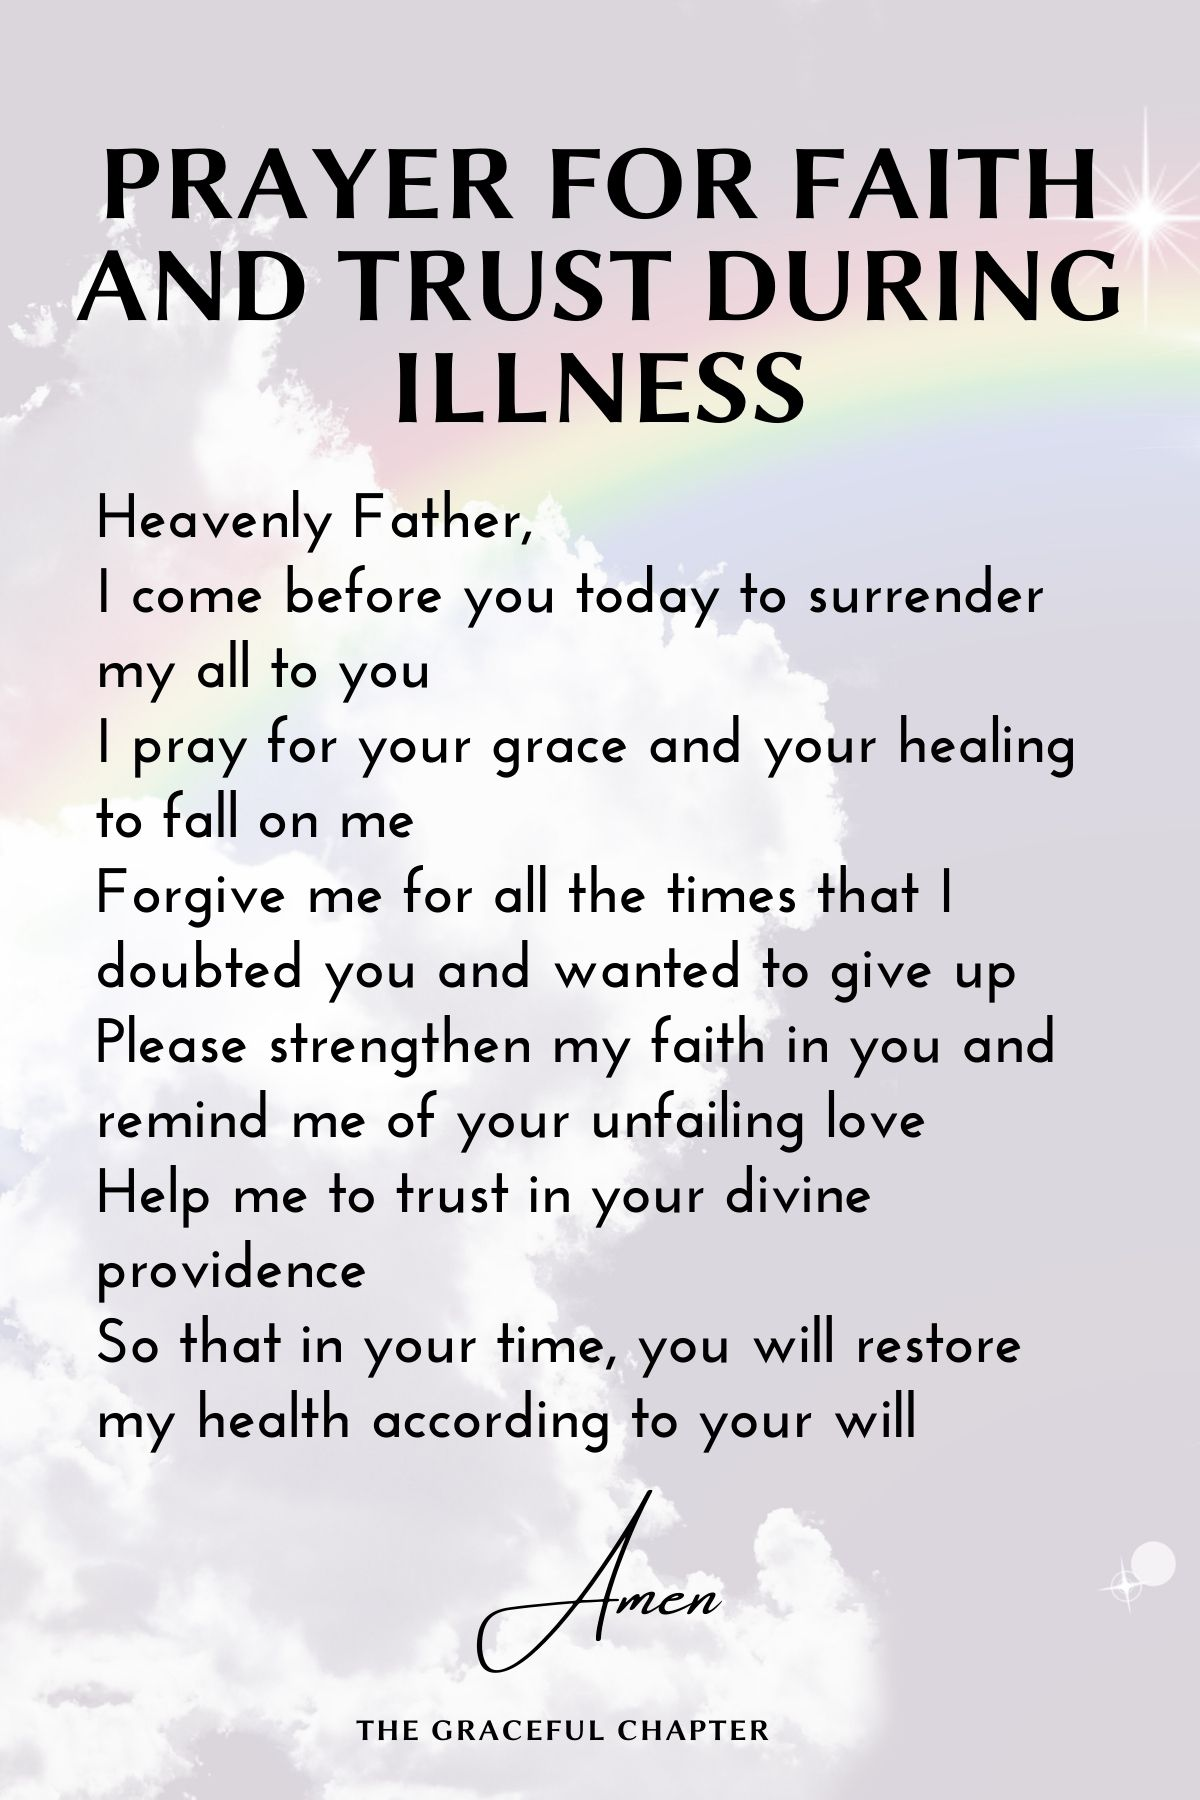 Prayer for faith and trust during illness